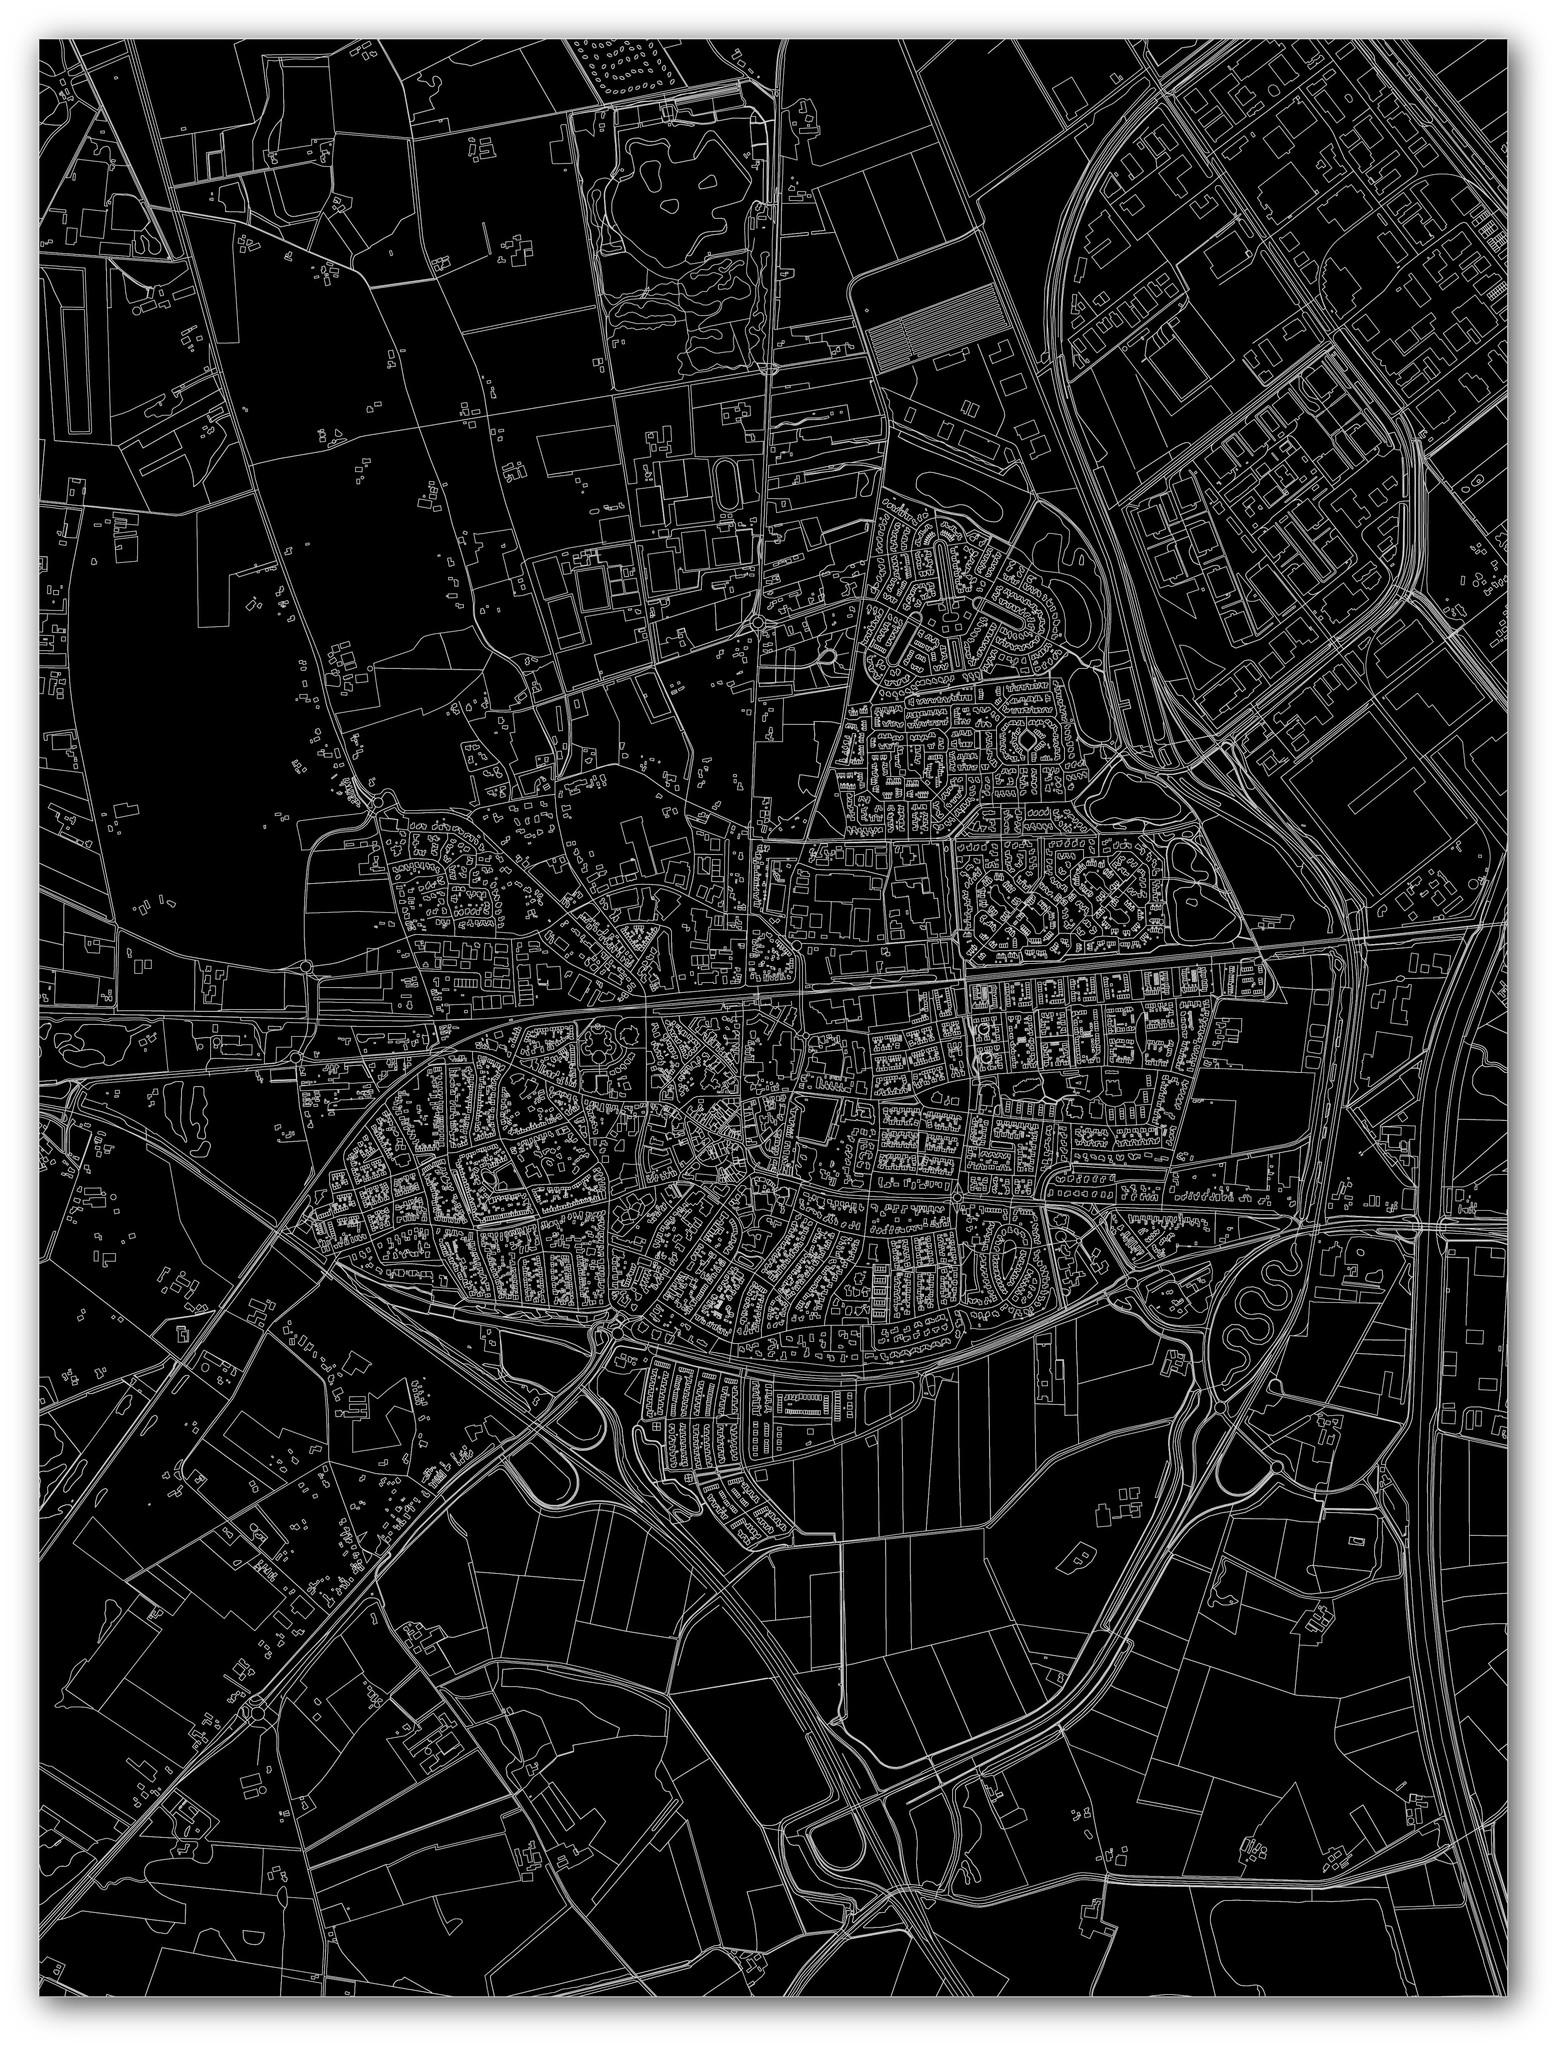 Stadtkarte Wierden | Aluminium Wanddekoration-4